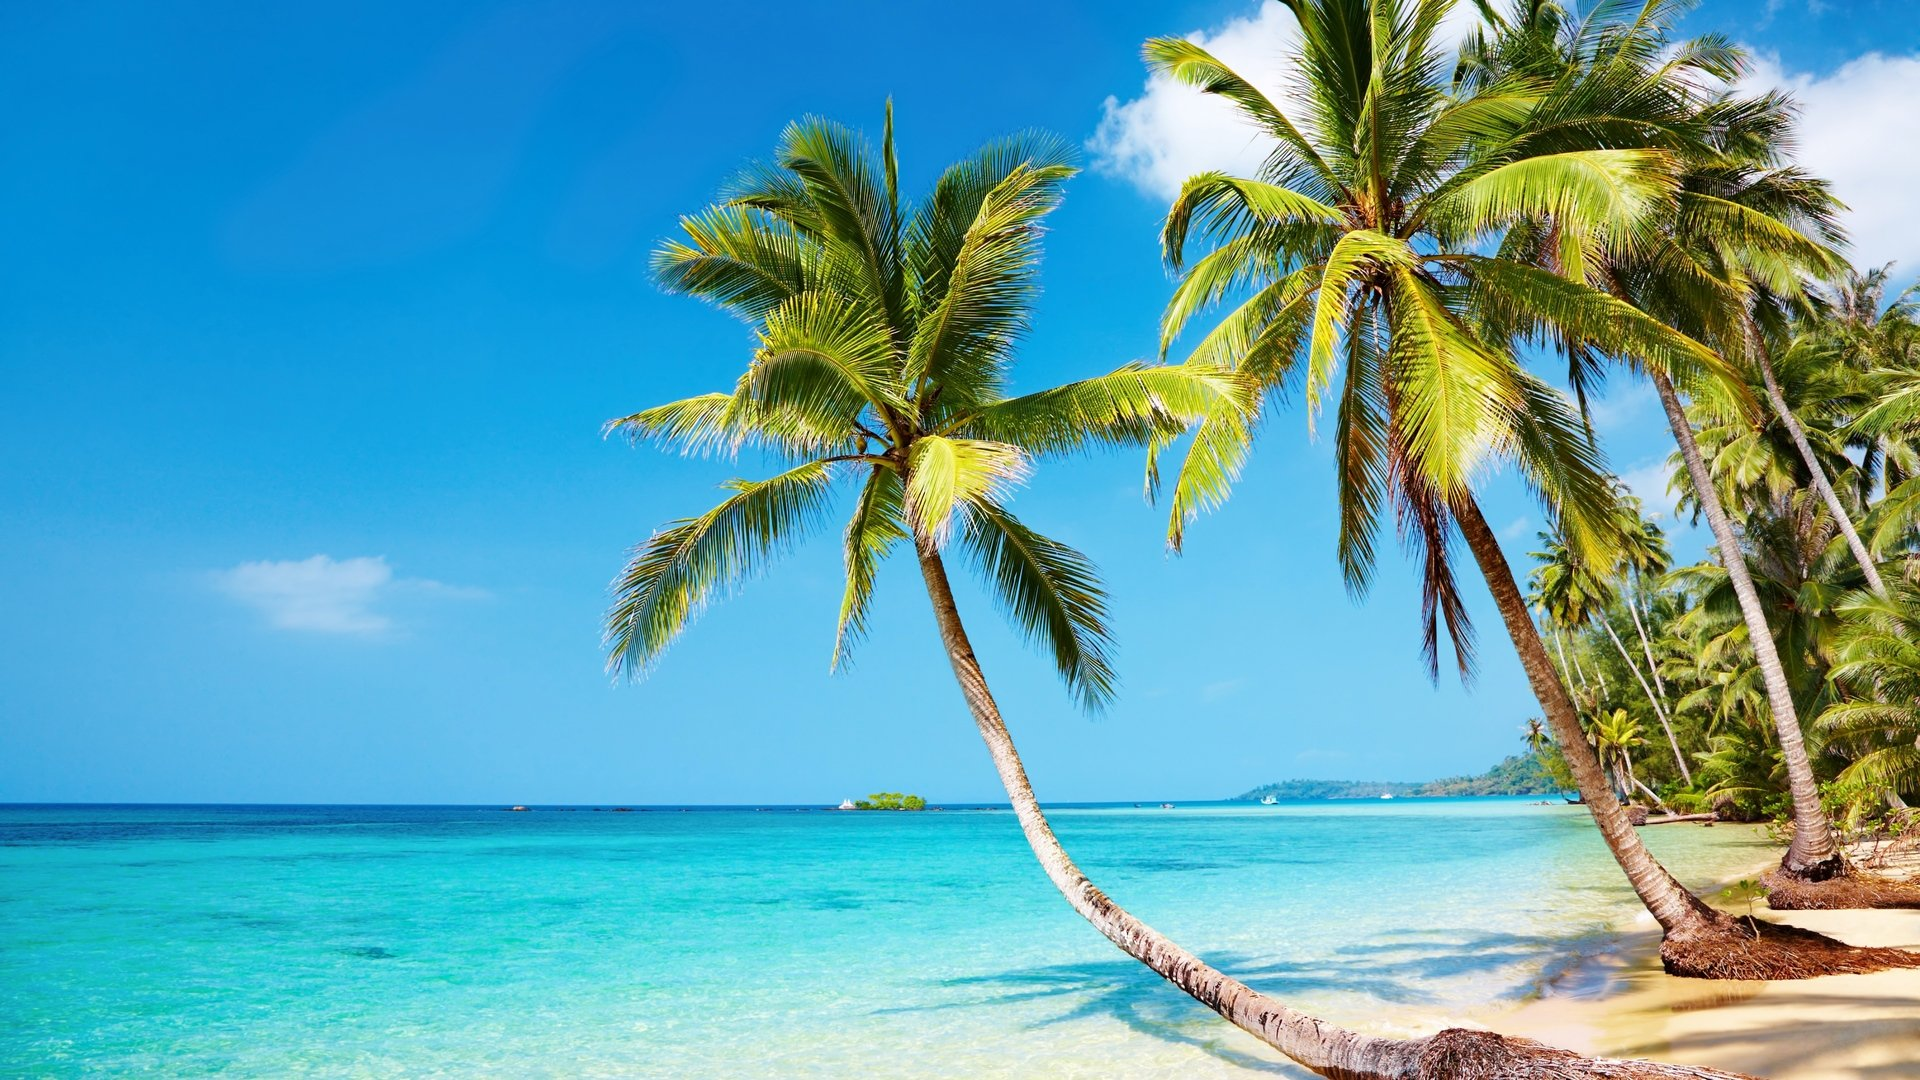 Tropical beach 4K Ultra HD wallpaper 4k WallpaperNet 1920x1080